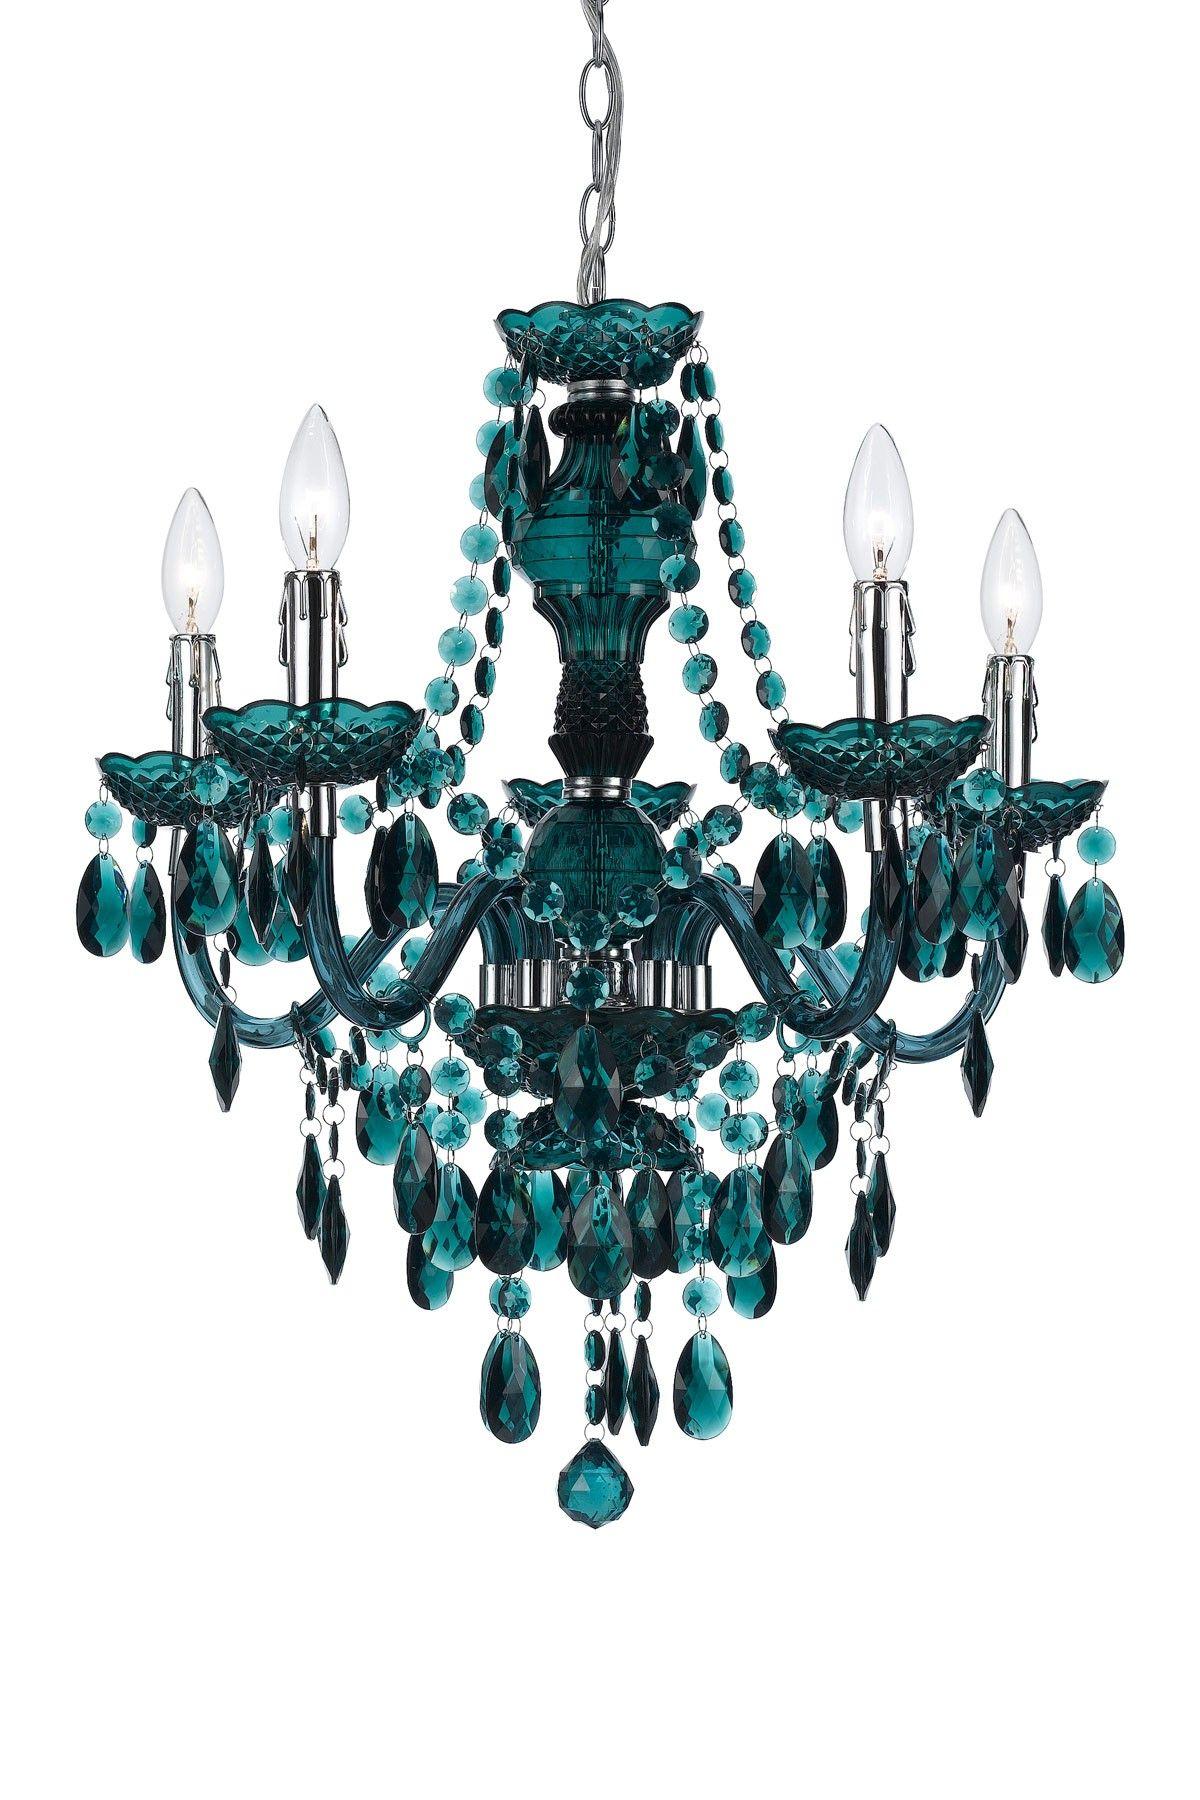 Angelohome fulton 5 light chandelier green light me up angelohome fulton 5 light chandelier green arubaitofo Images